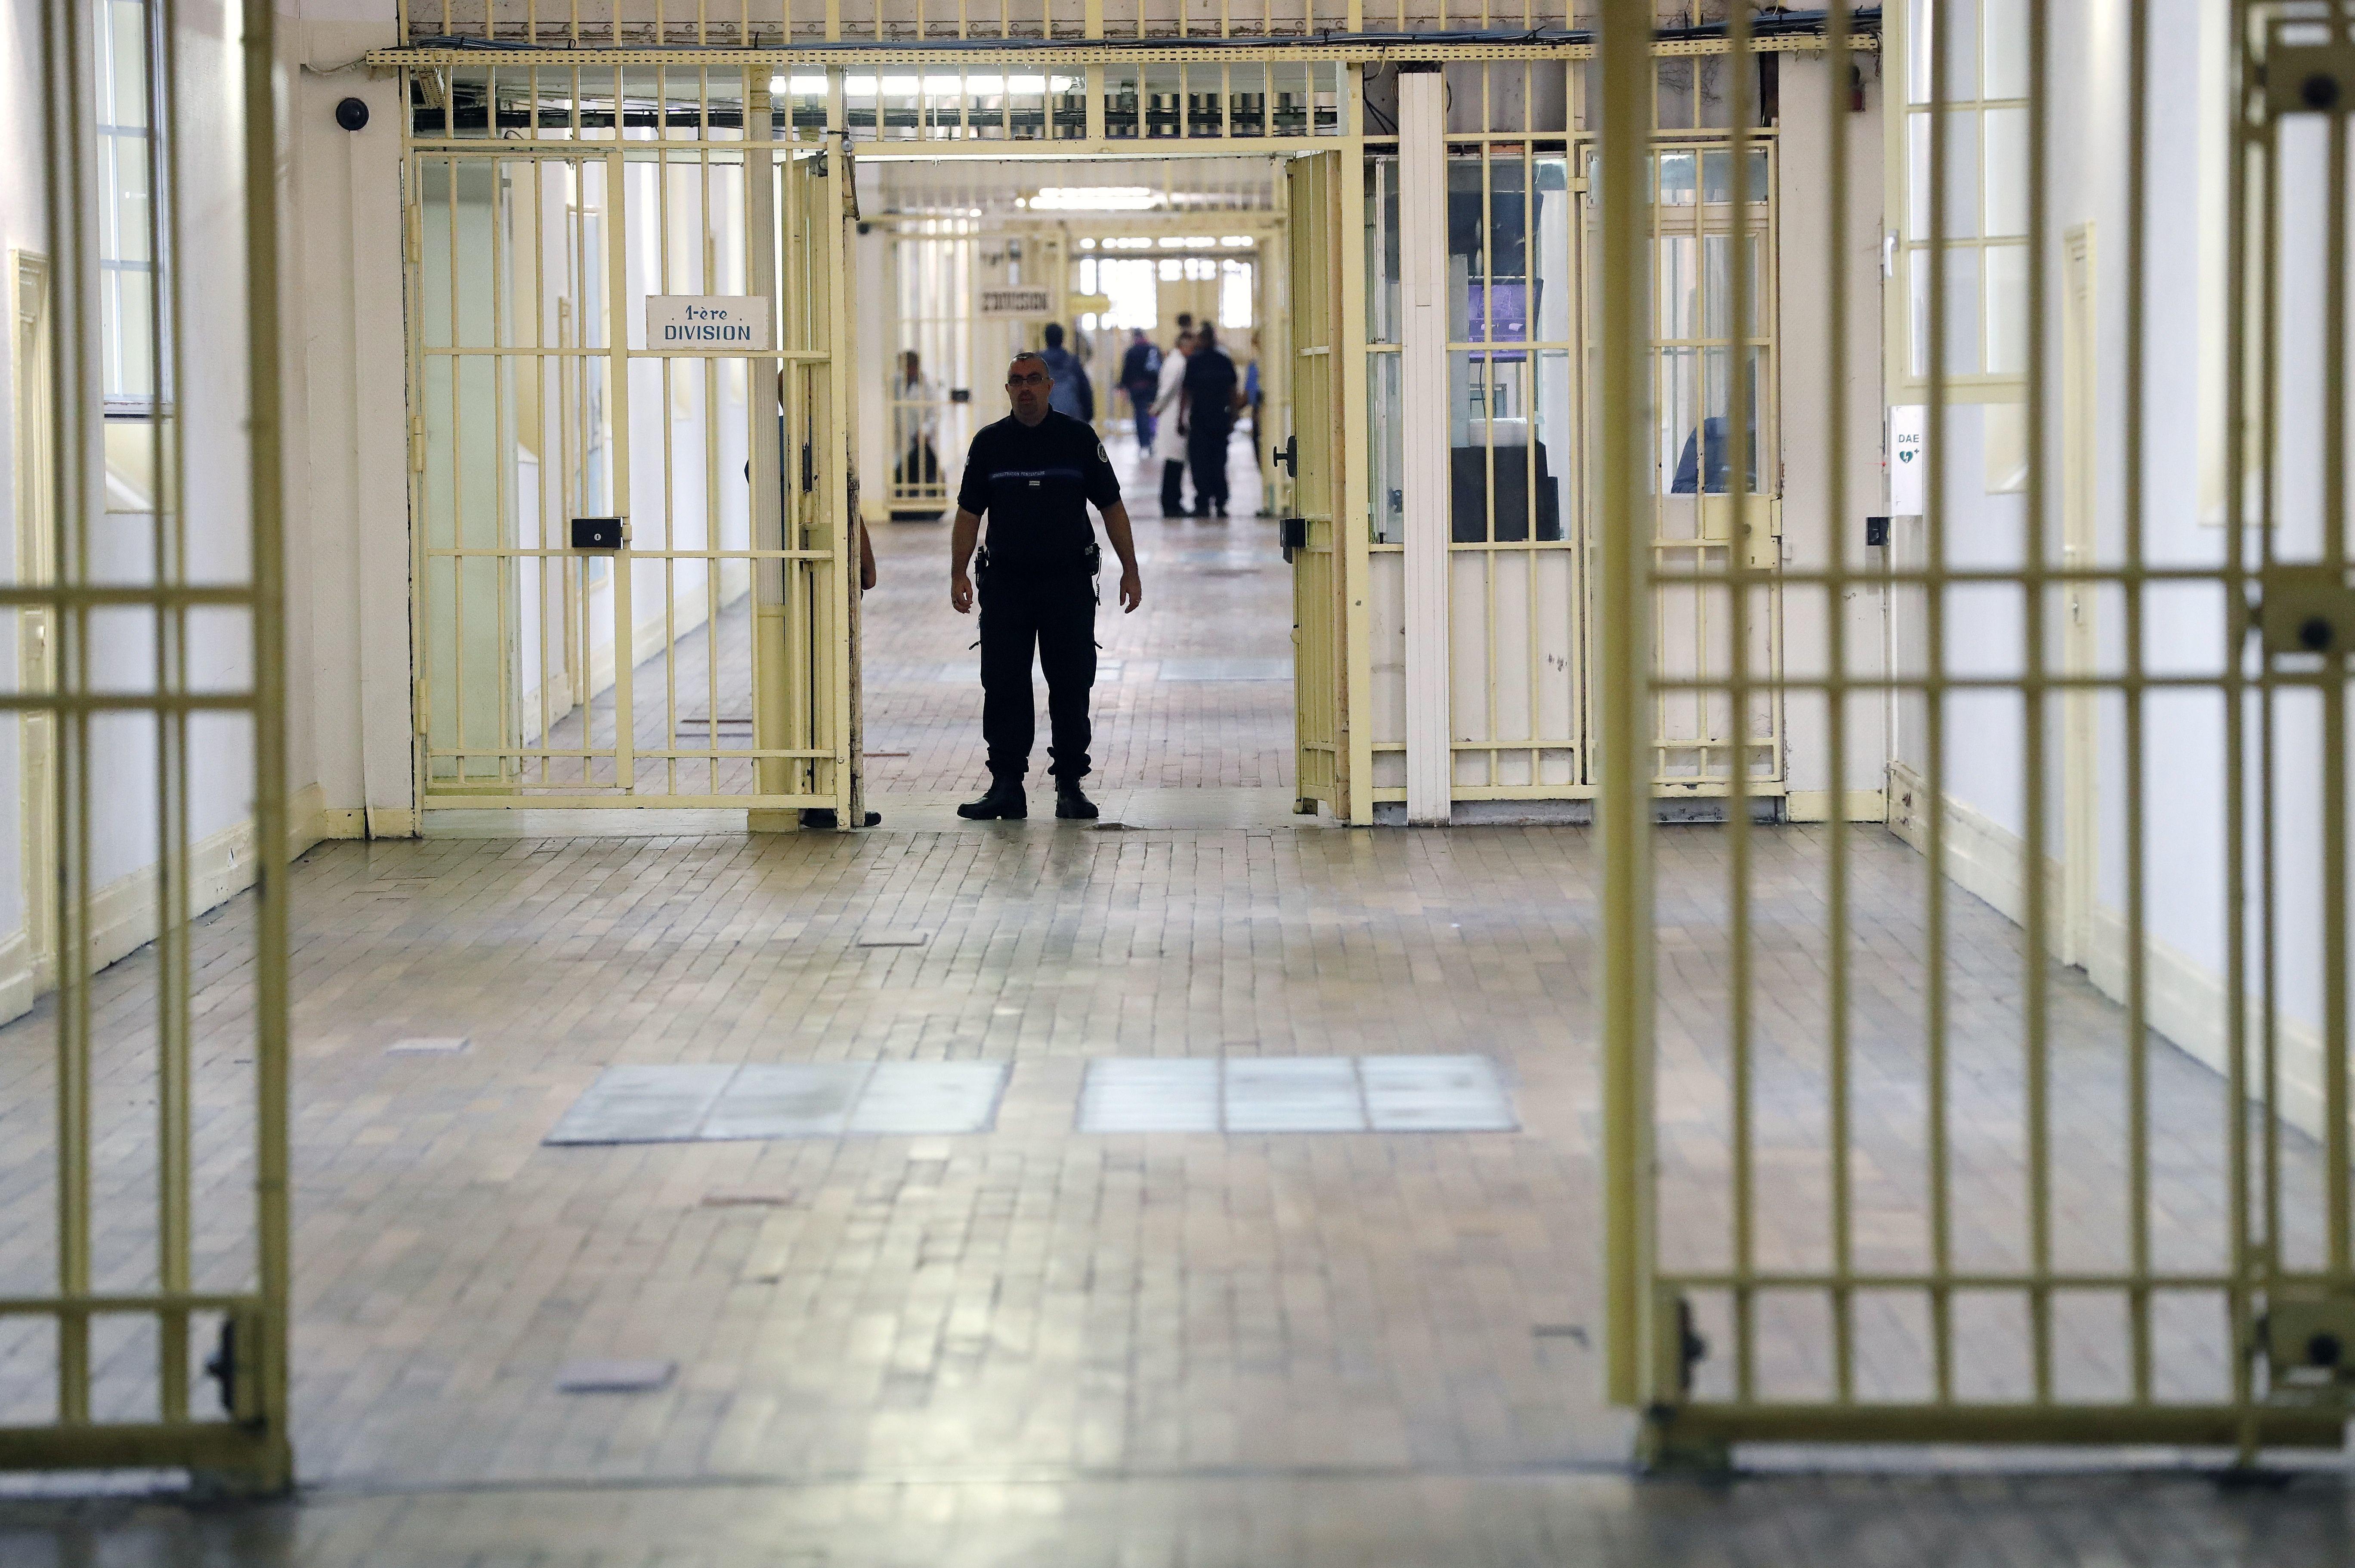 Inside French Prisons, A Struggle To Combat Radicalization